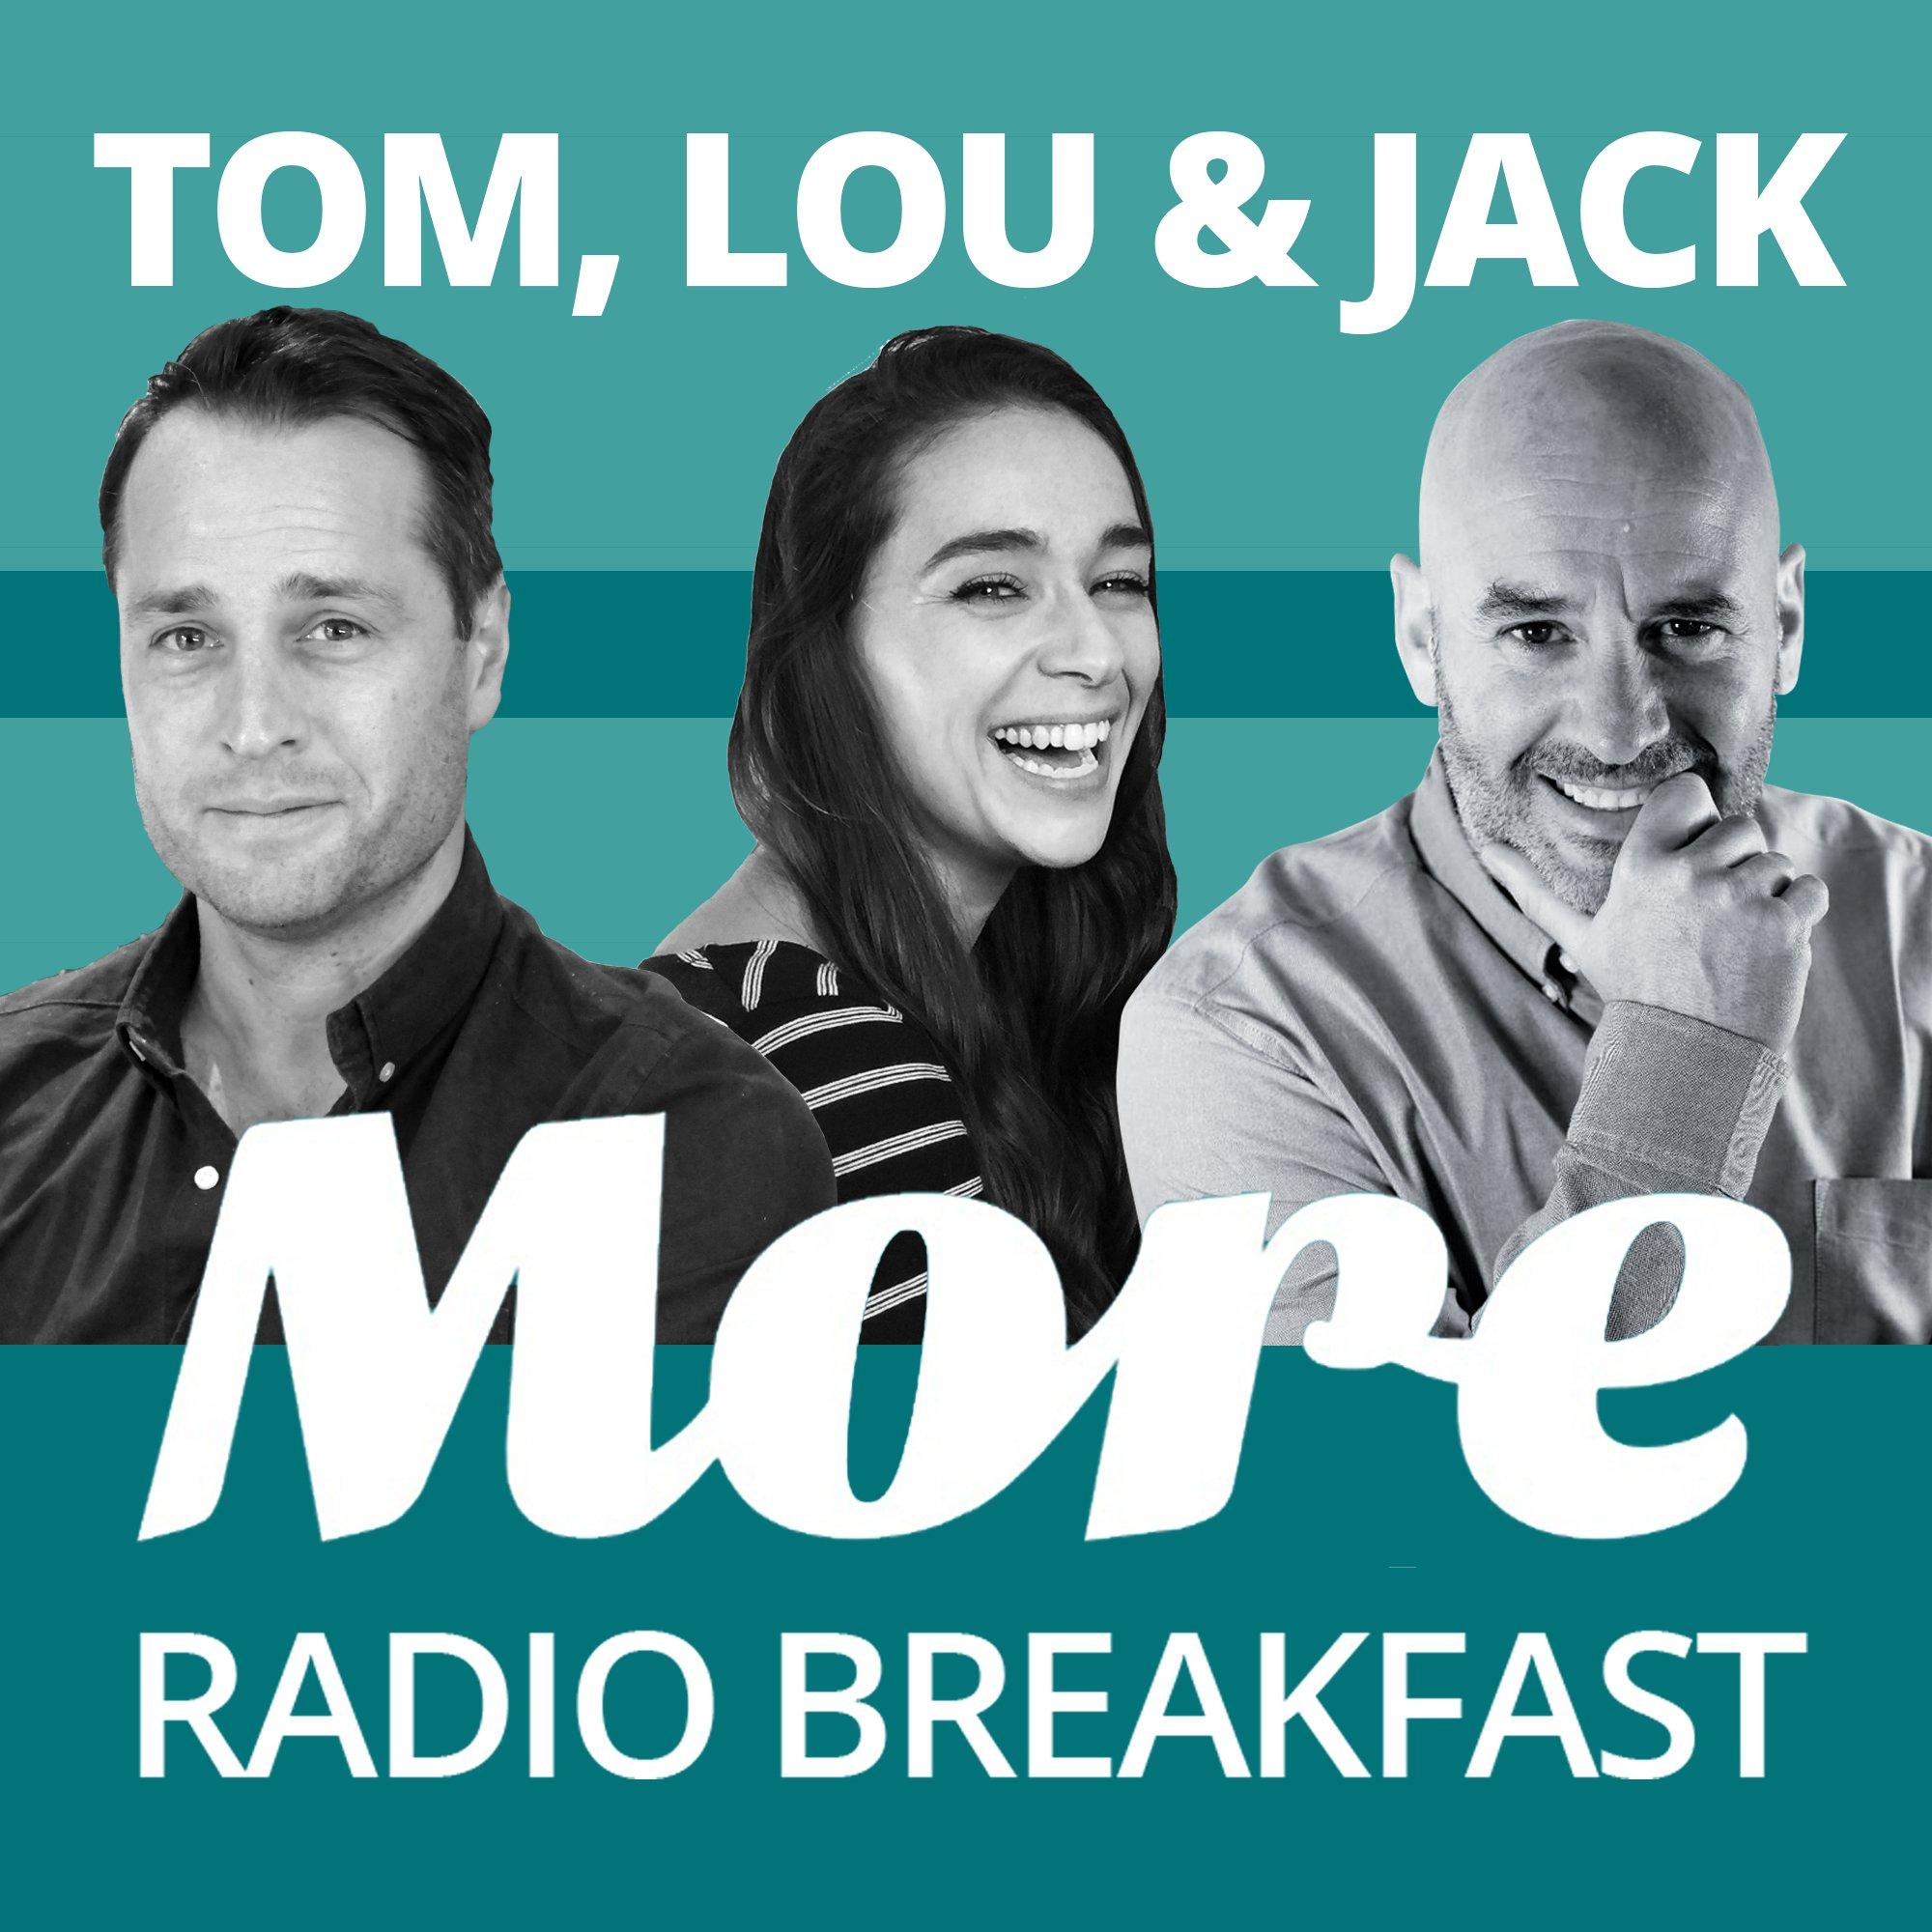 Even More Radio Breakfast